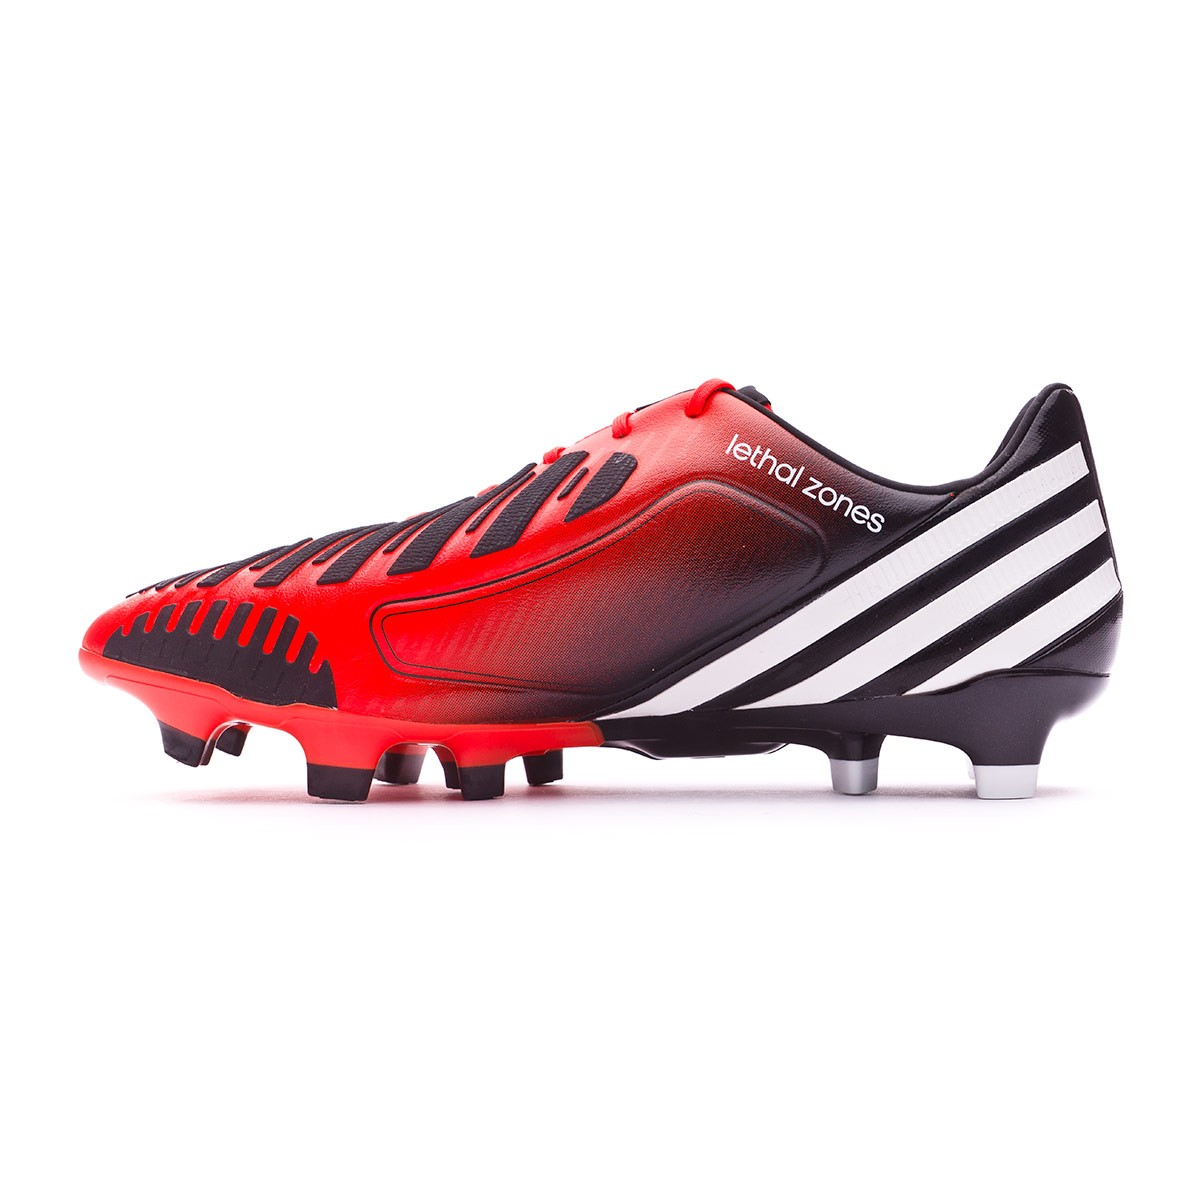 hot sale online 3a309 f1091 ... Bota Predator LZ TRX FG Roja-Negra. CATEGORY. Football boots · adidas  football boots